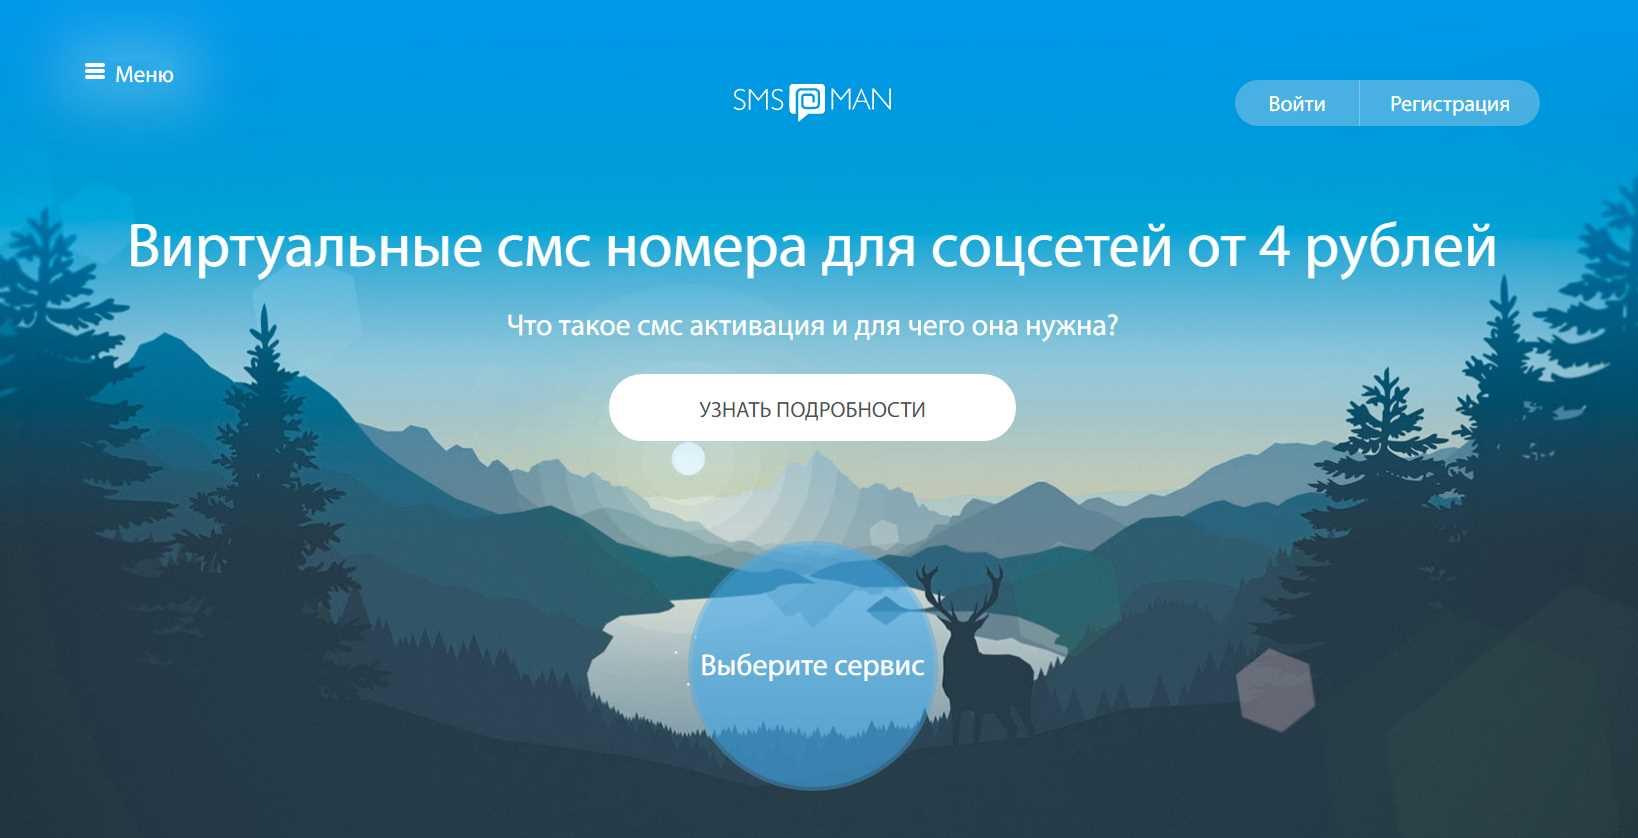 sms-man.ru